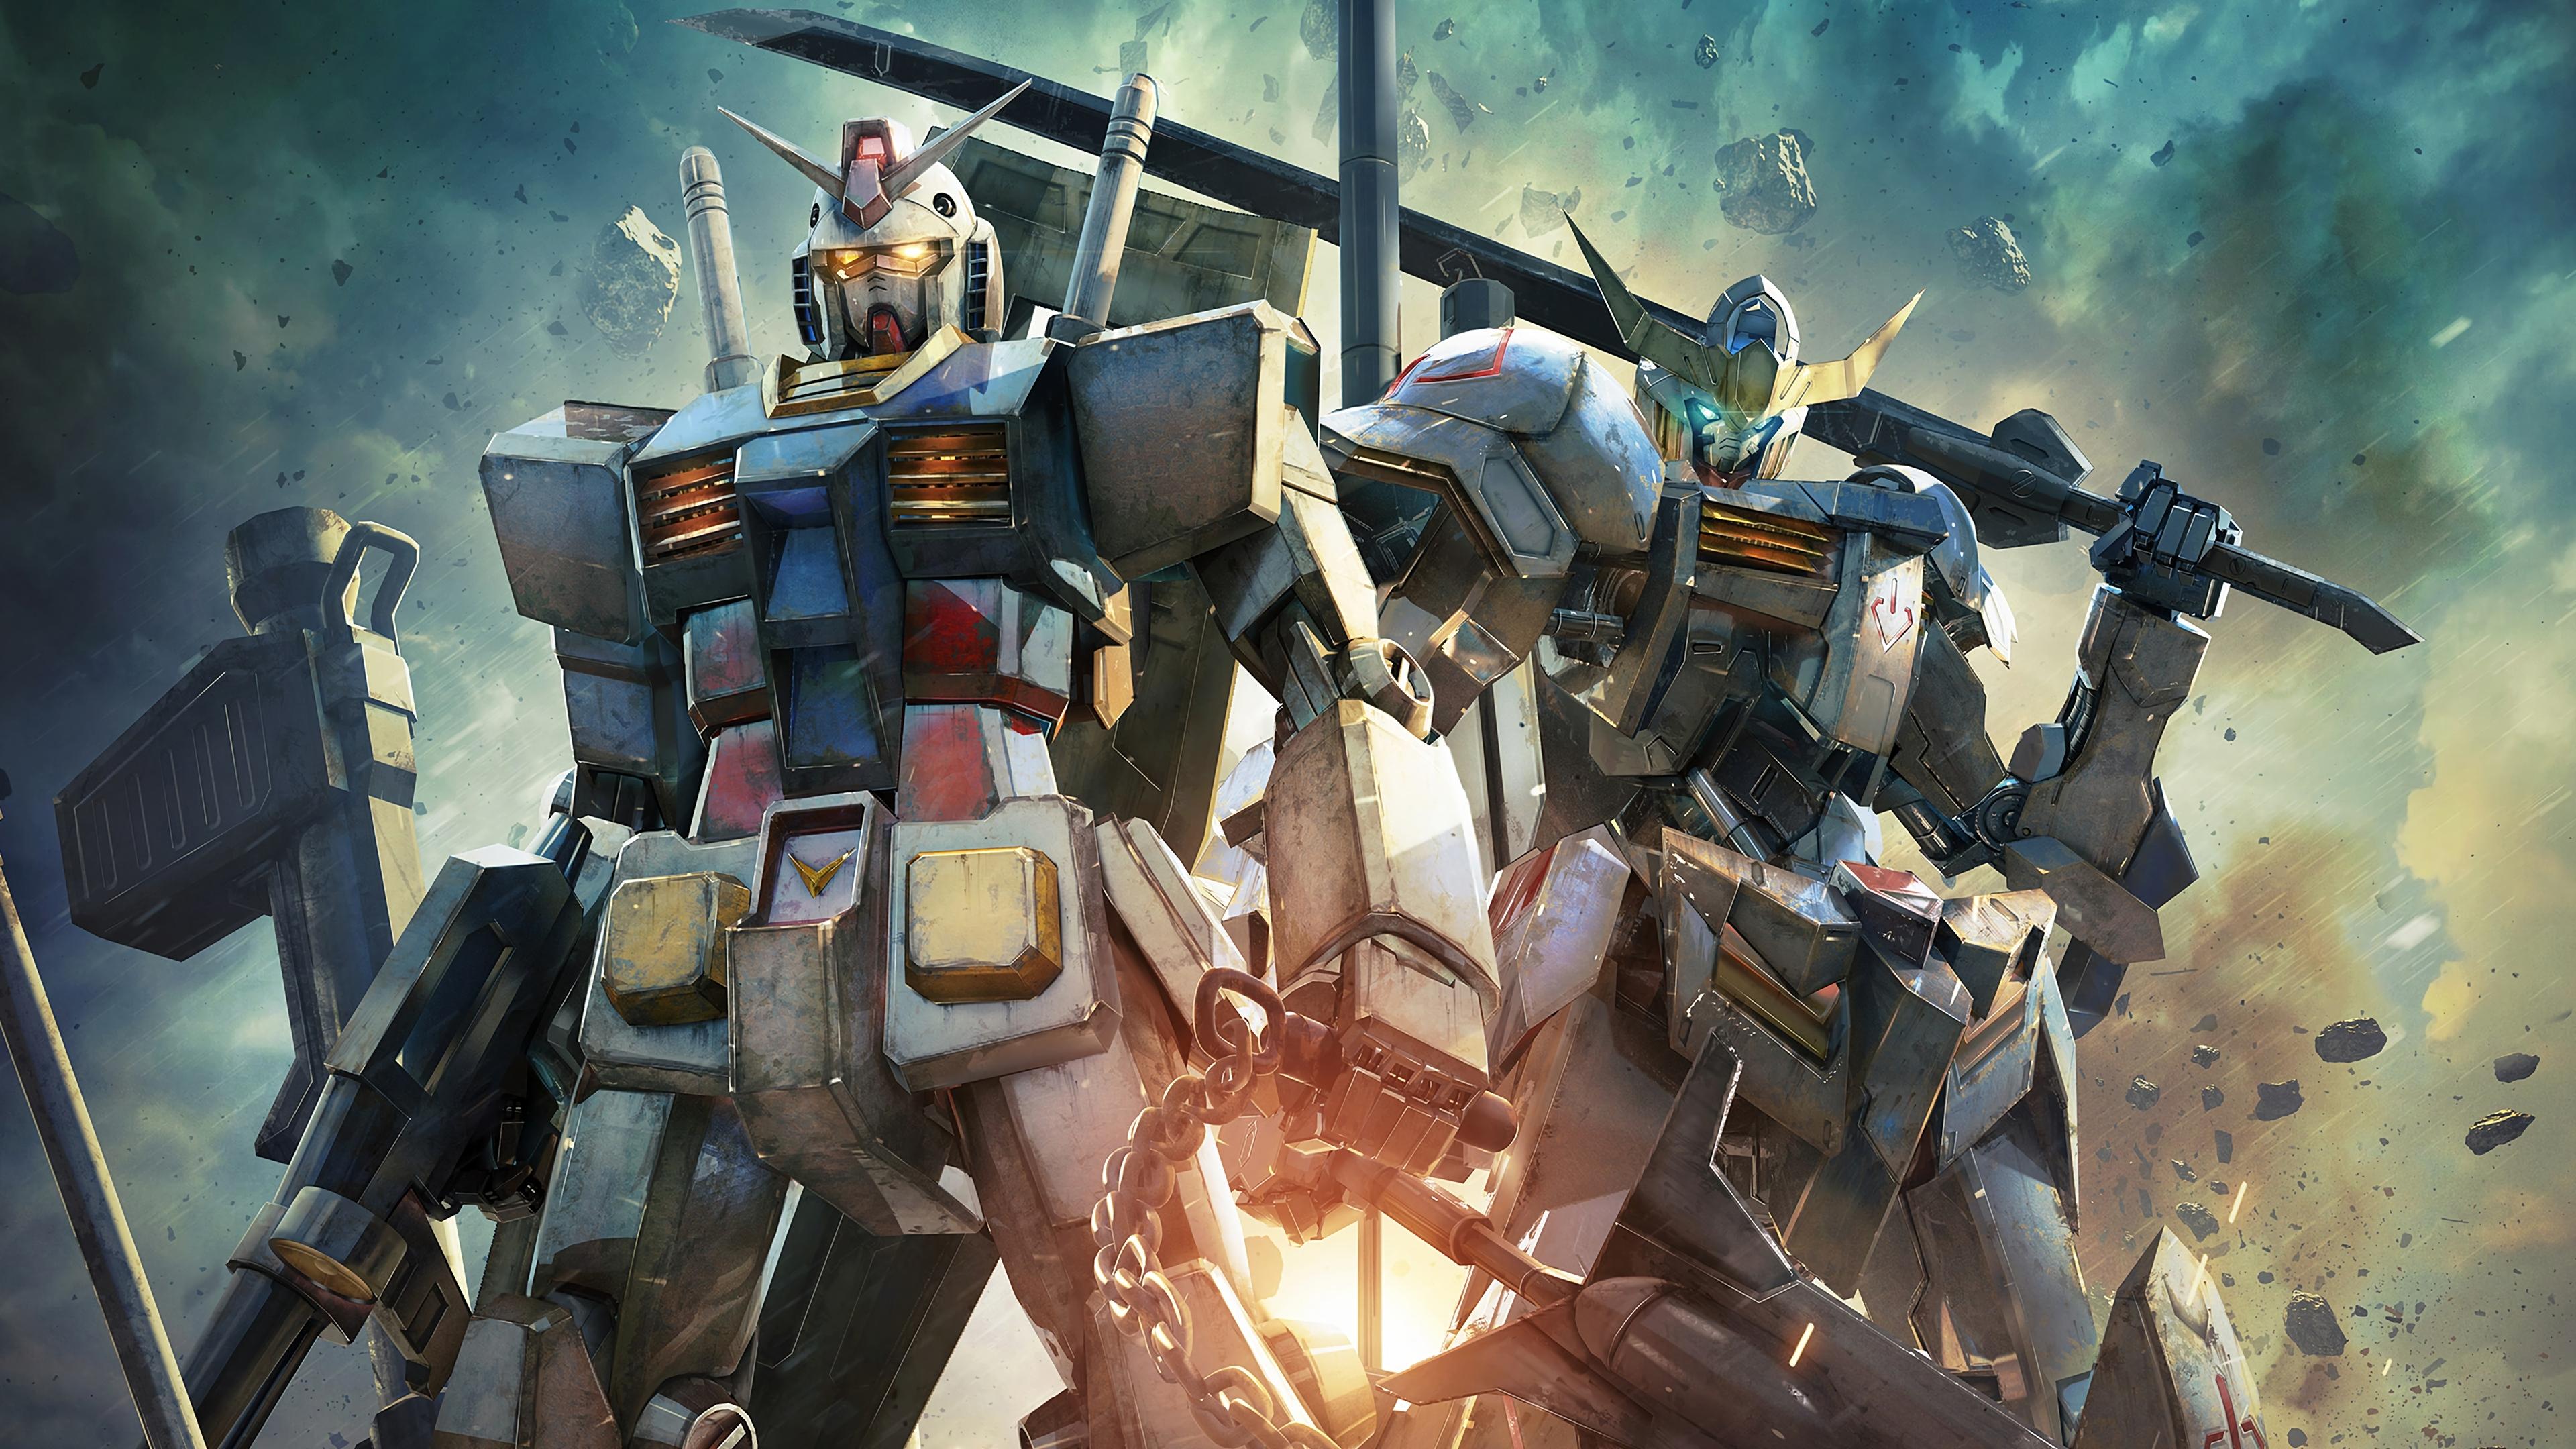 American Graffiti Cars Wallpaper Gundam Wallpaper Hd Media File Pixelstalk Net